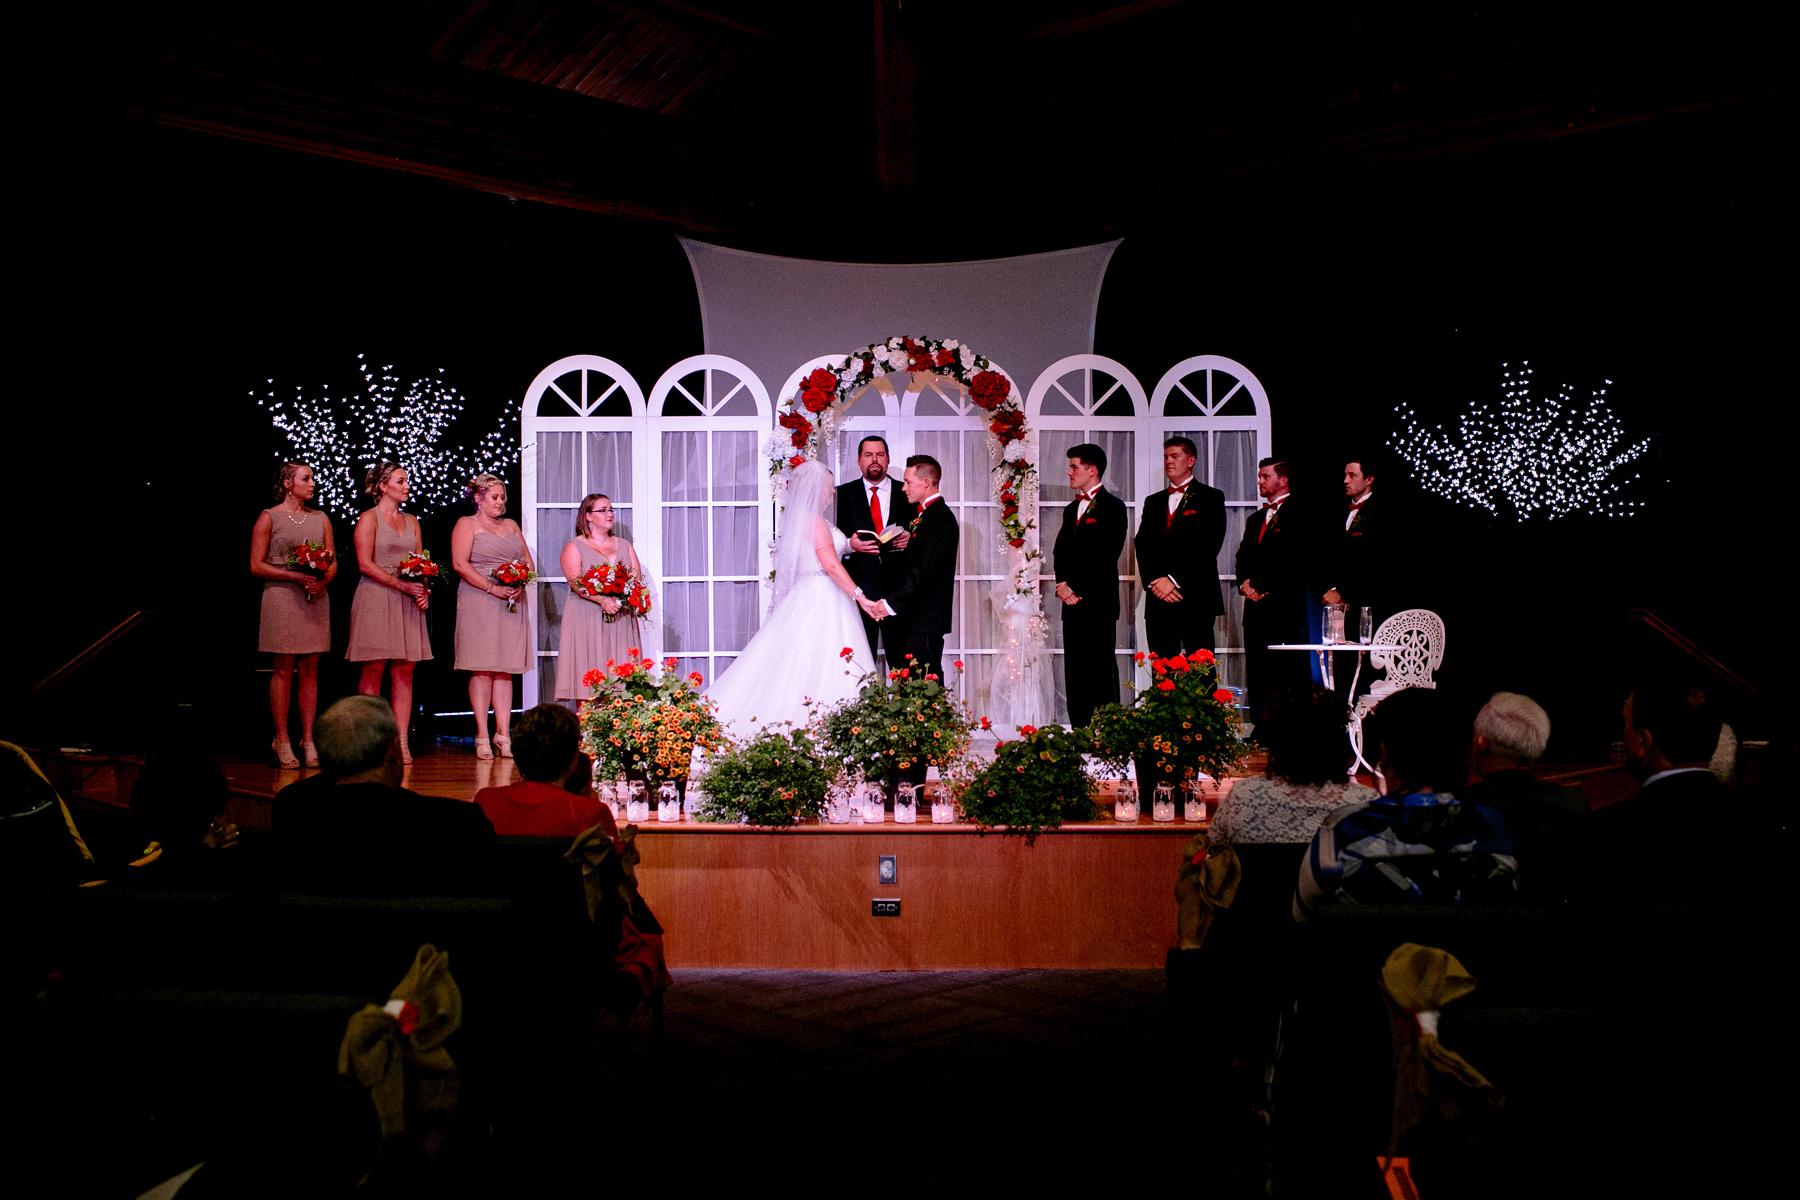 019-awesome-pei-wedding-photography-kandisebrown-jg2016